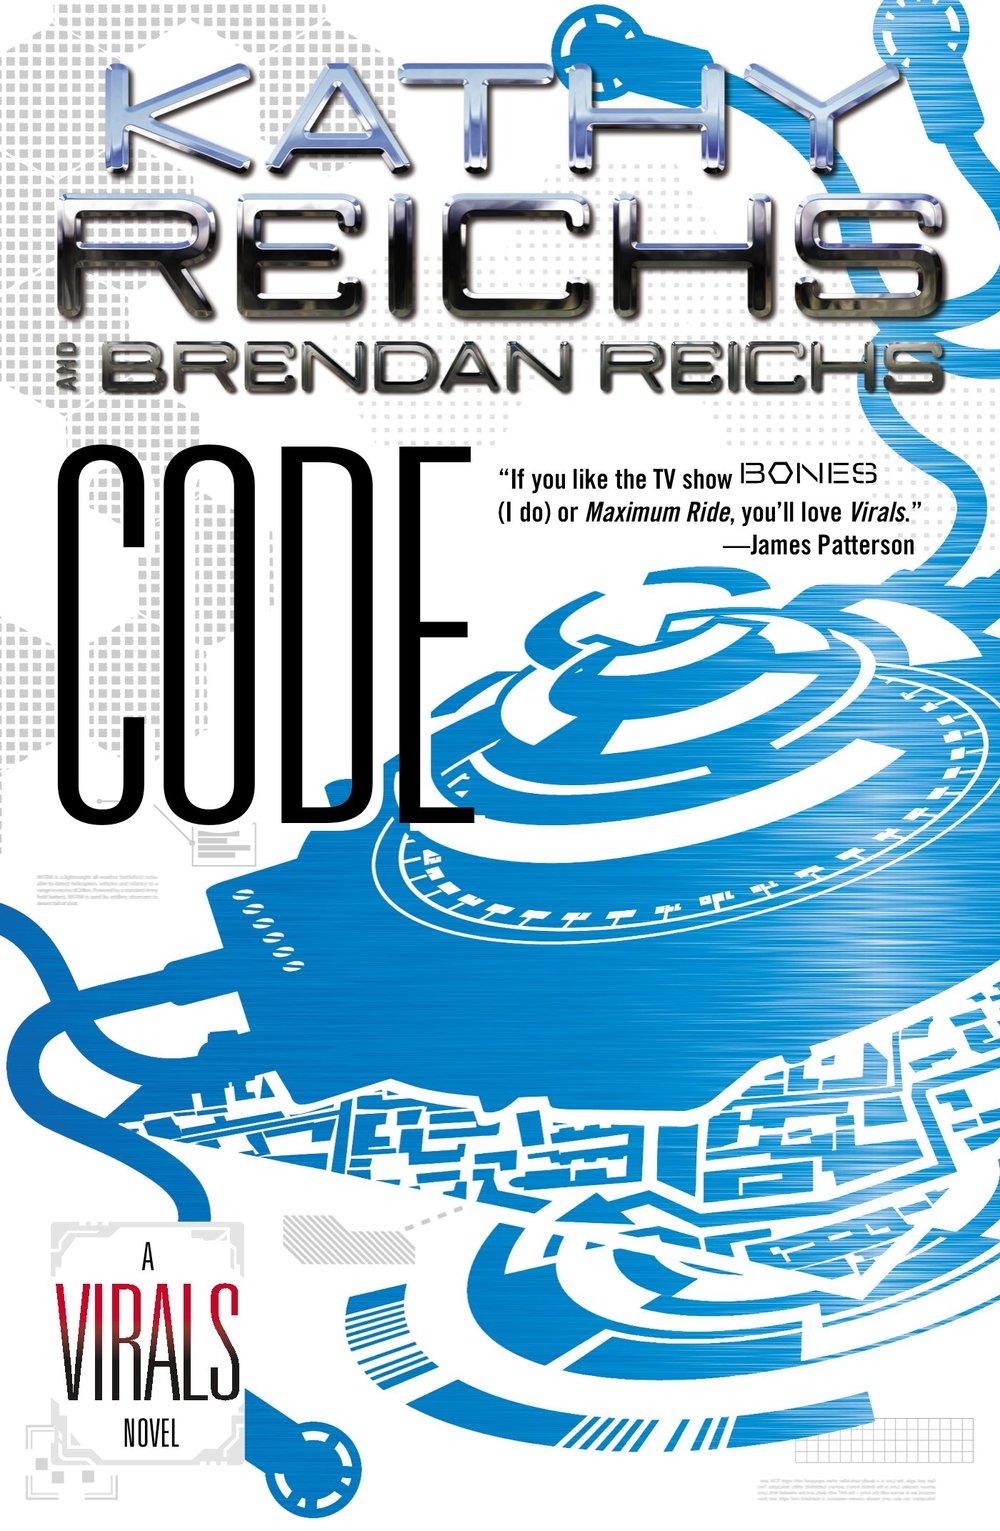 brendan-reichs-code.jpg